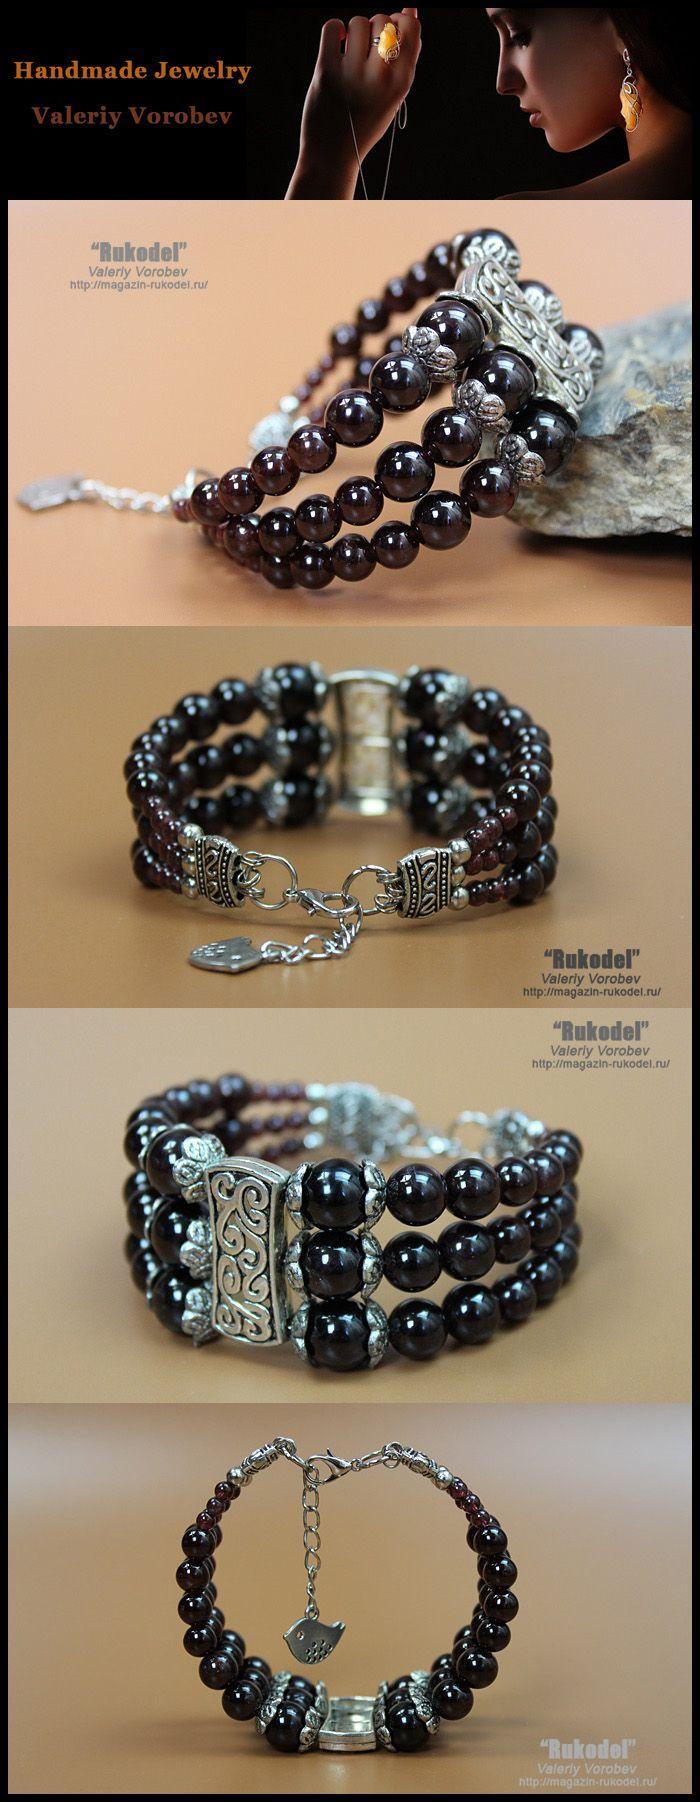 Photo of Stone jewelry. Beaded bracelets. Bracelet garnet beads. Bracelets for women.